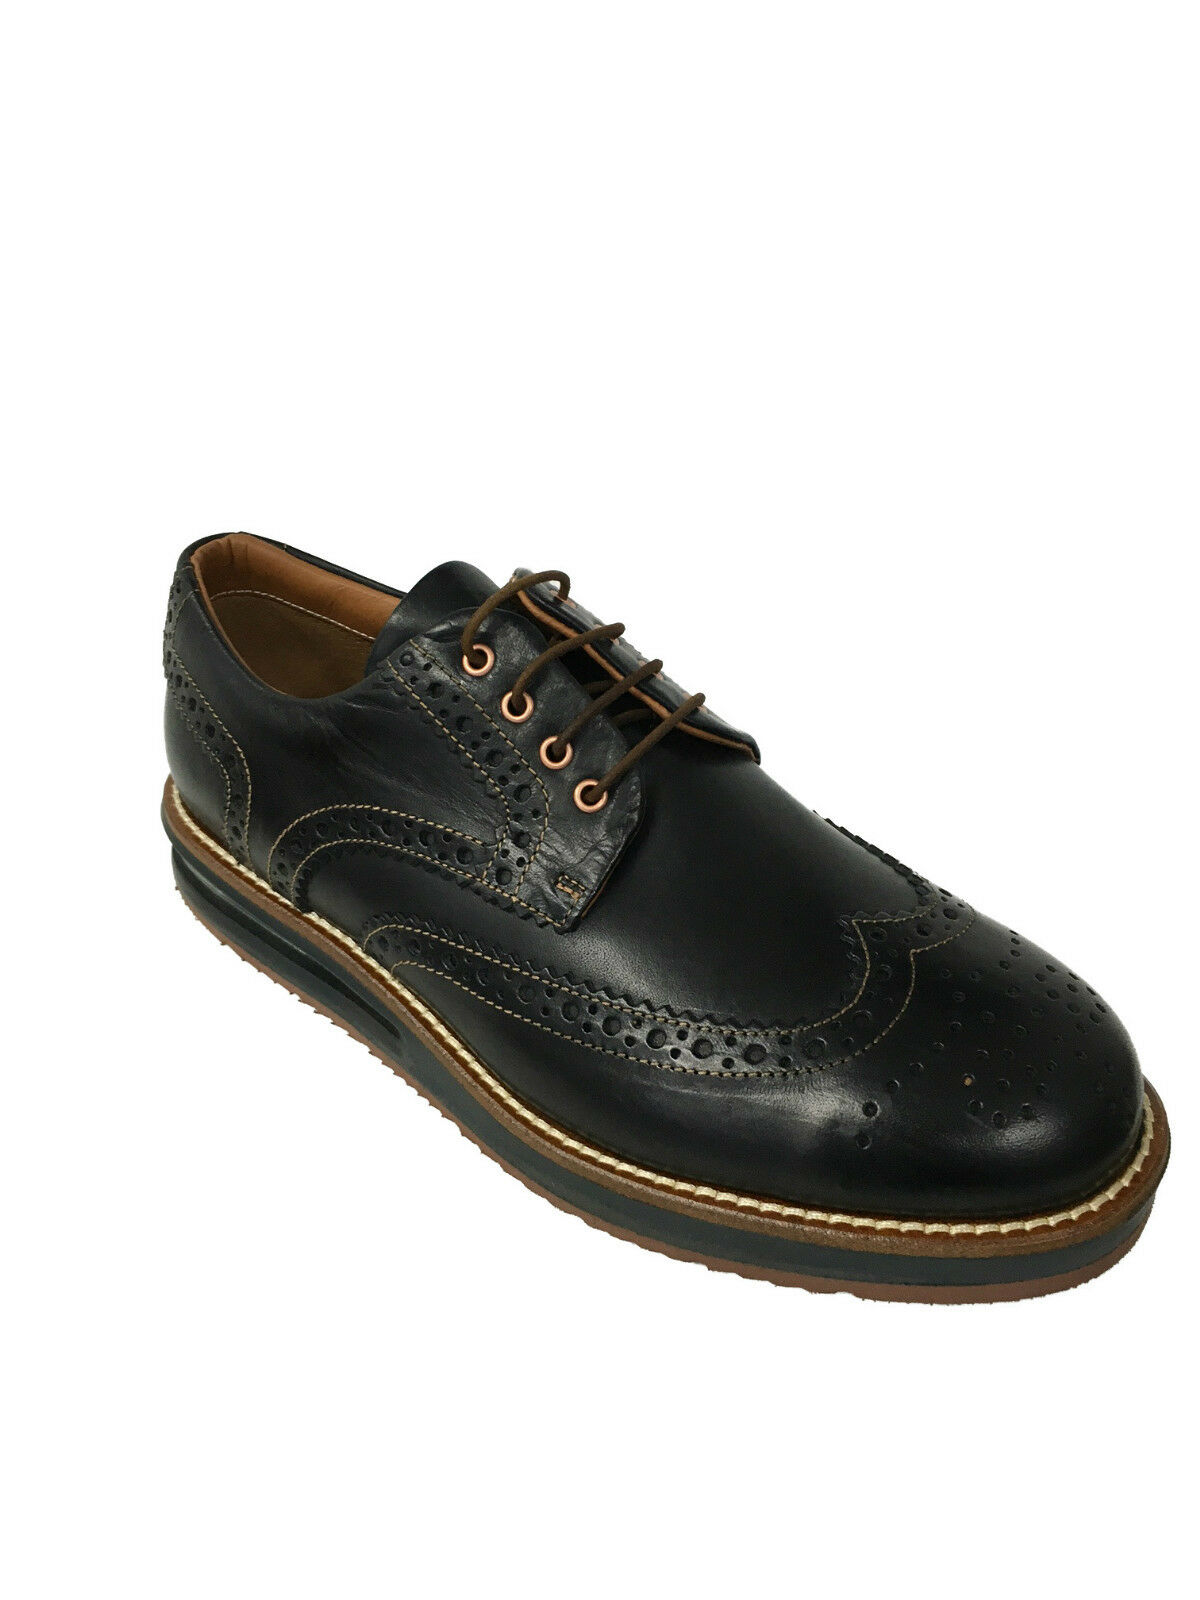 BARLEYCORN scarpa uomo allacciata nero mod COWHIDE 100% pelle MADE IN ITALY